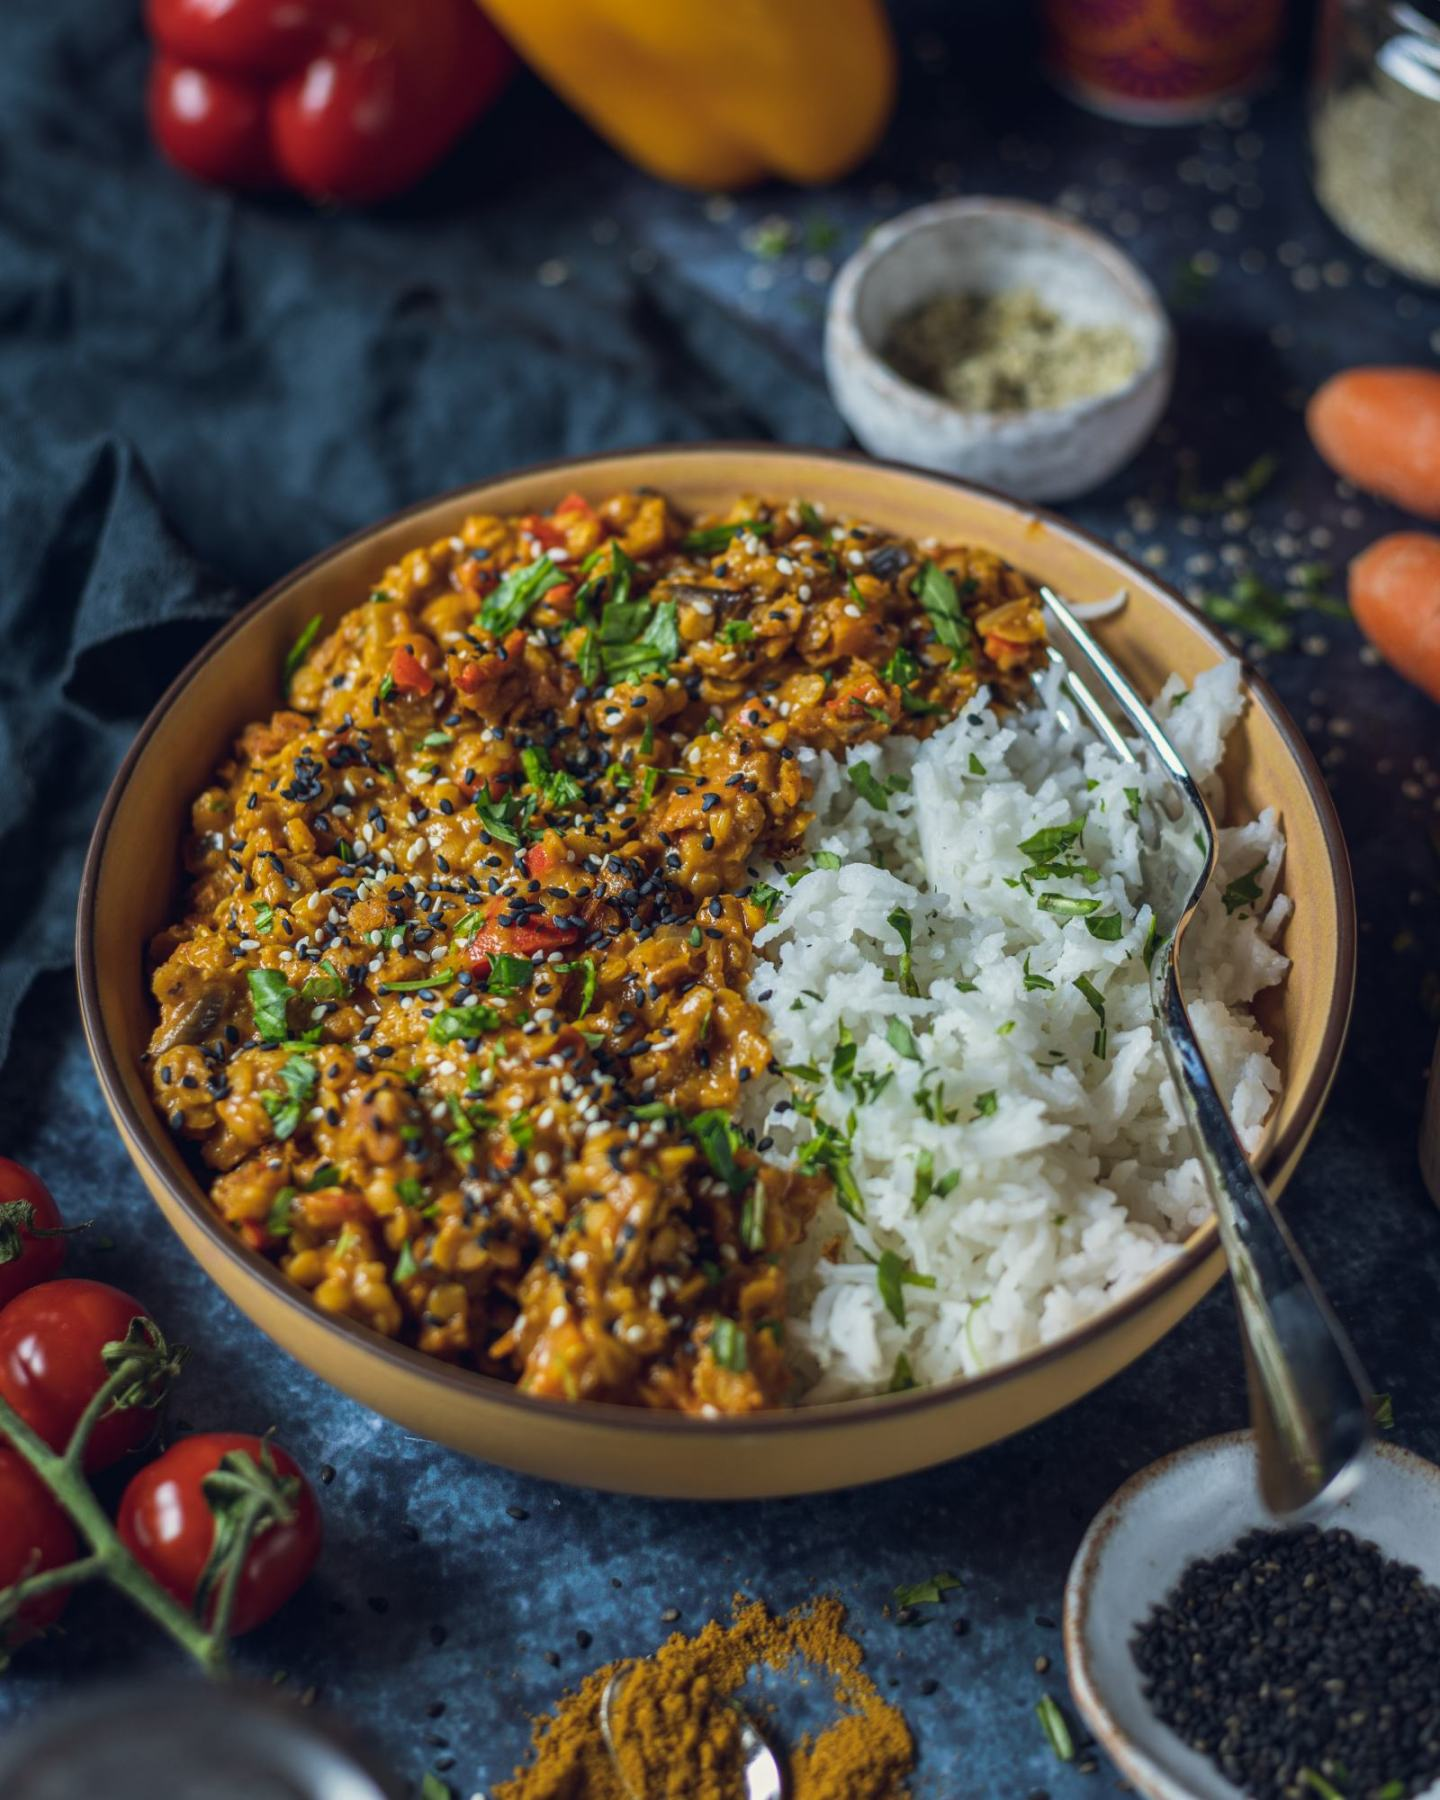 Easy Vegan Red Lentil Dhal Recipe